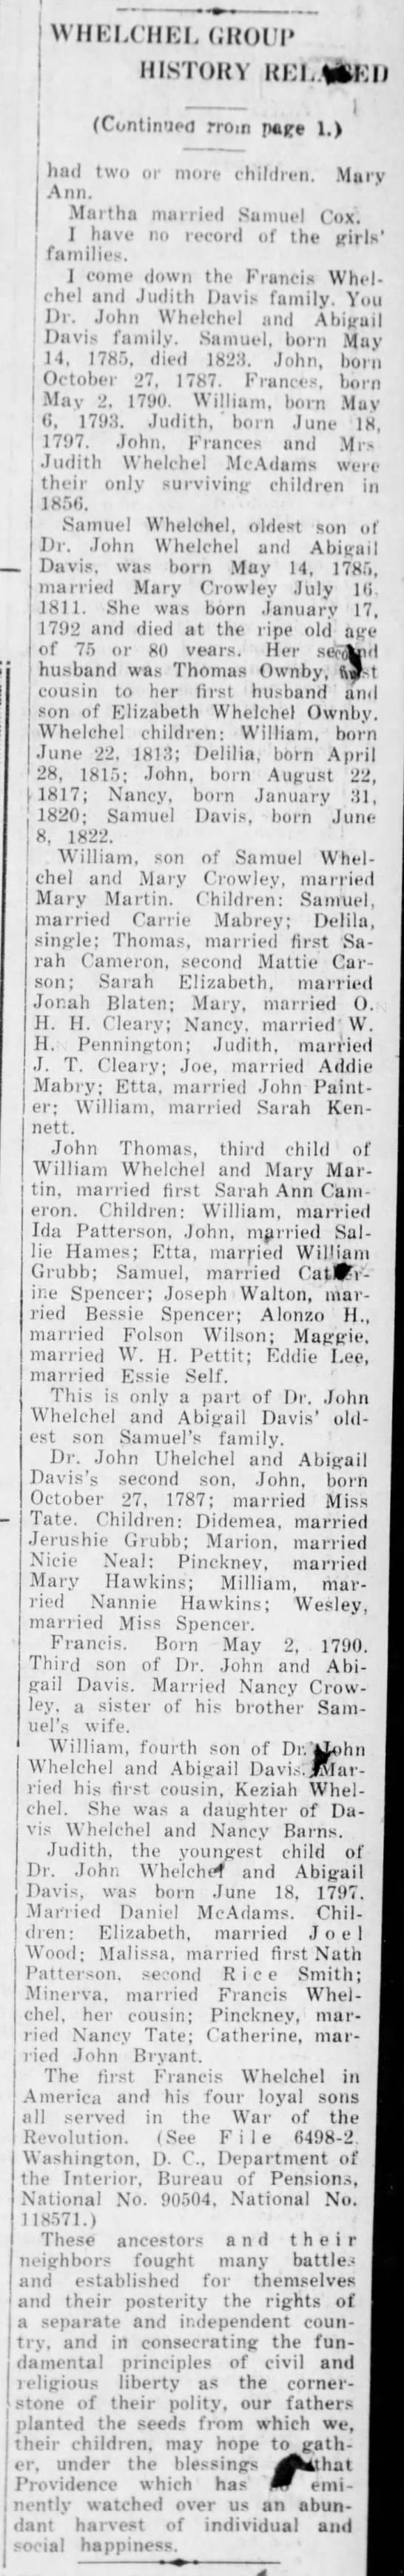 Whelchel Group History